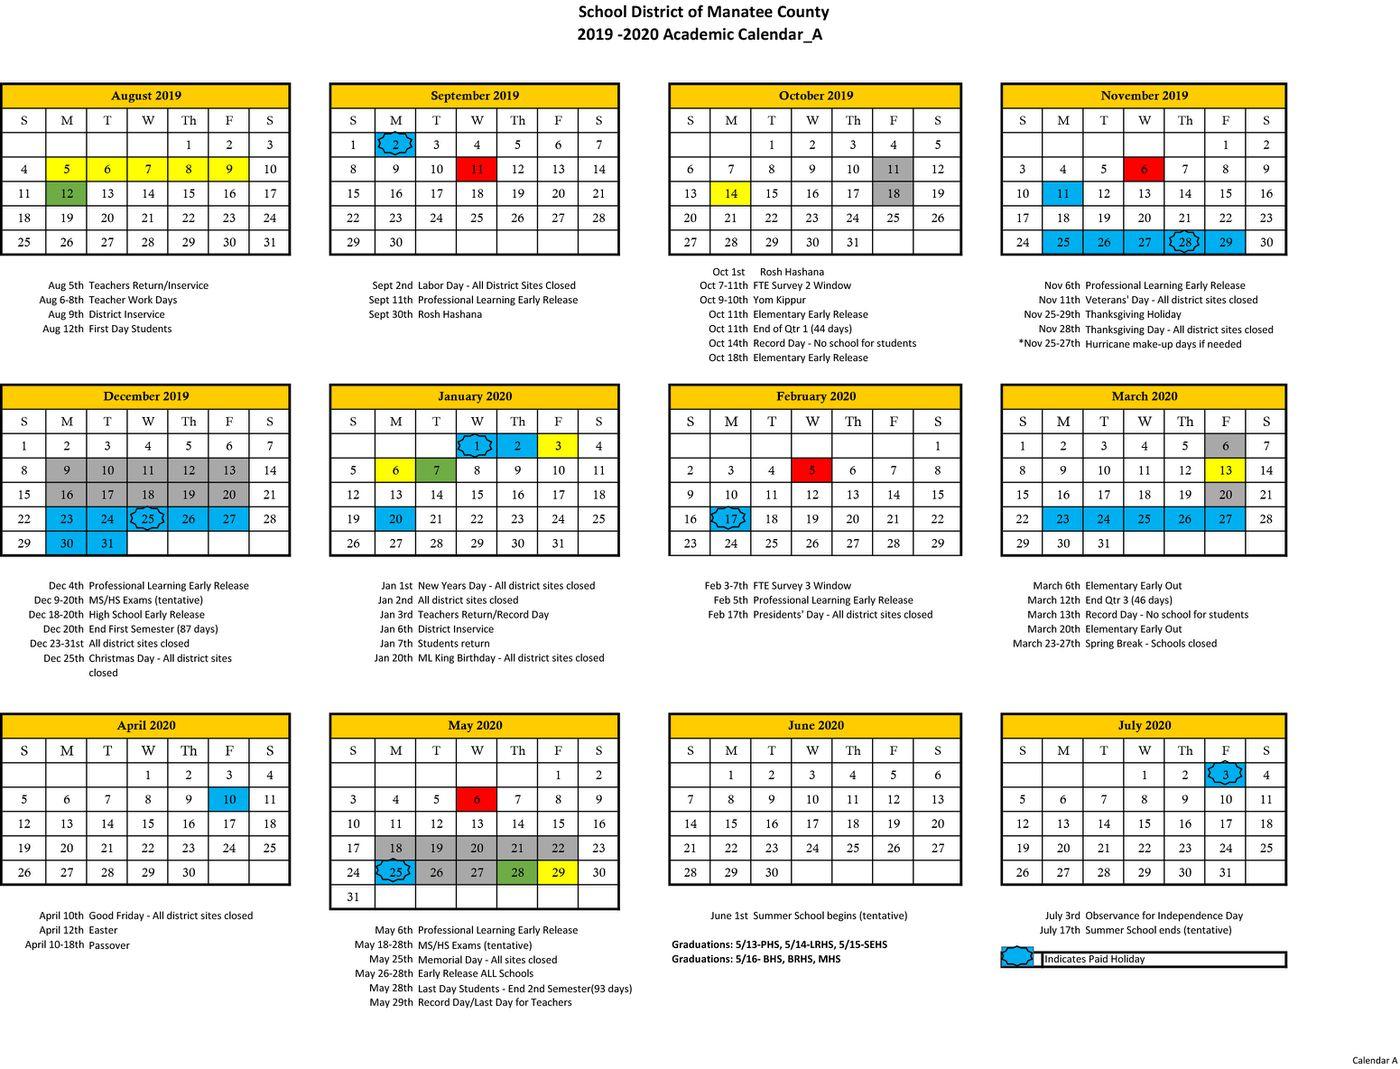 Manatee County School Calendar 2020 | Free Printable Calendar With Wake County School District Calenders